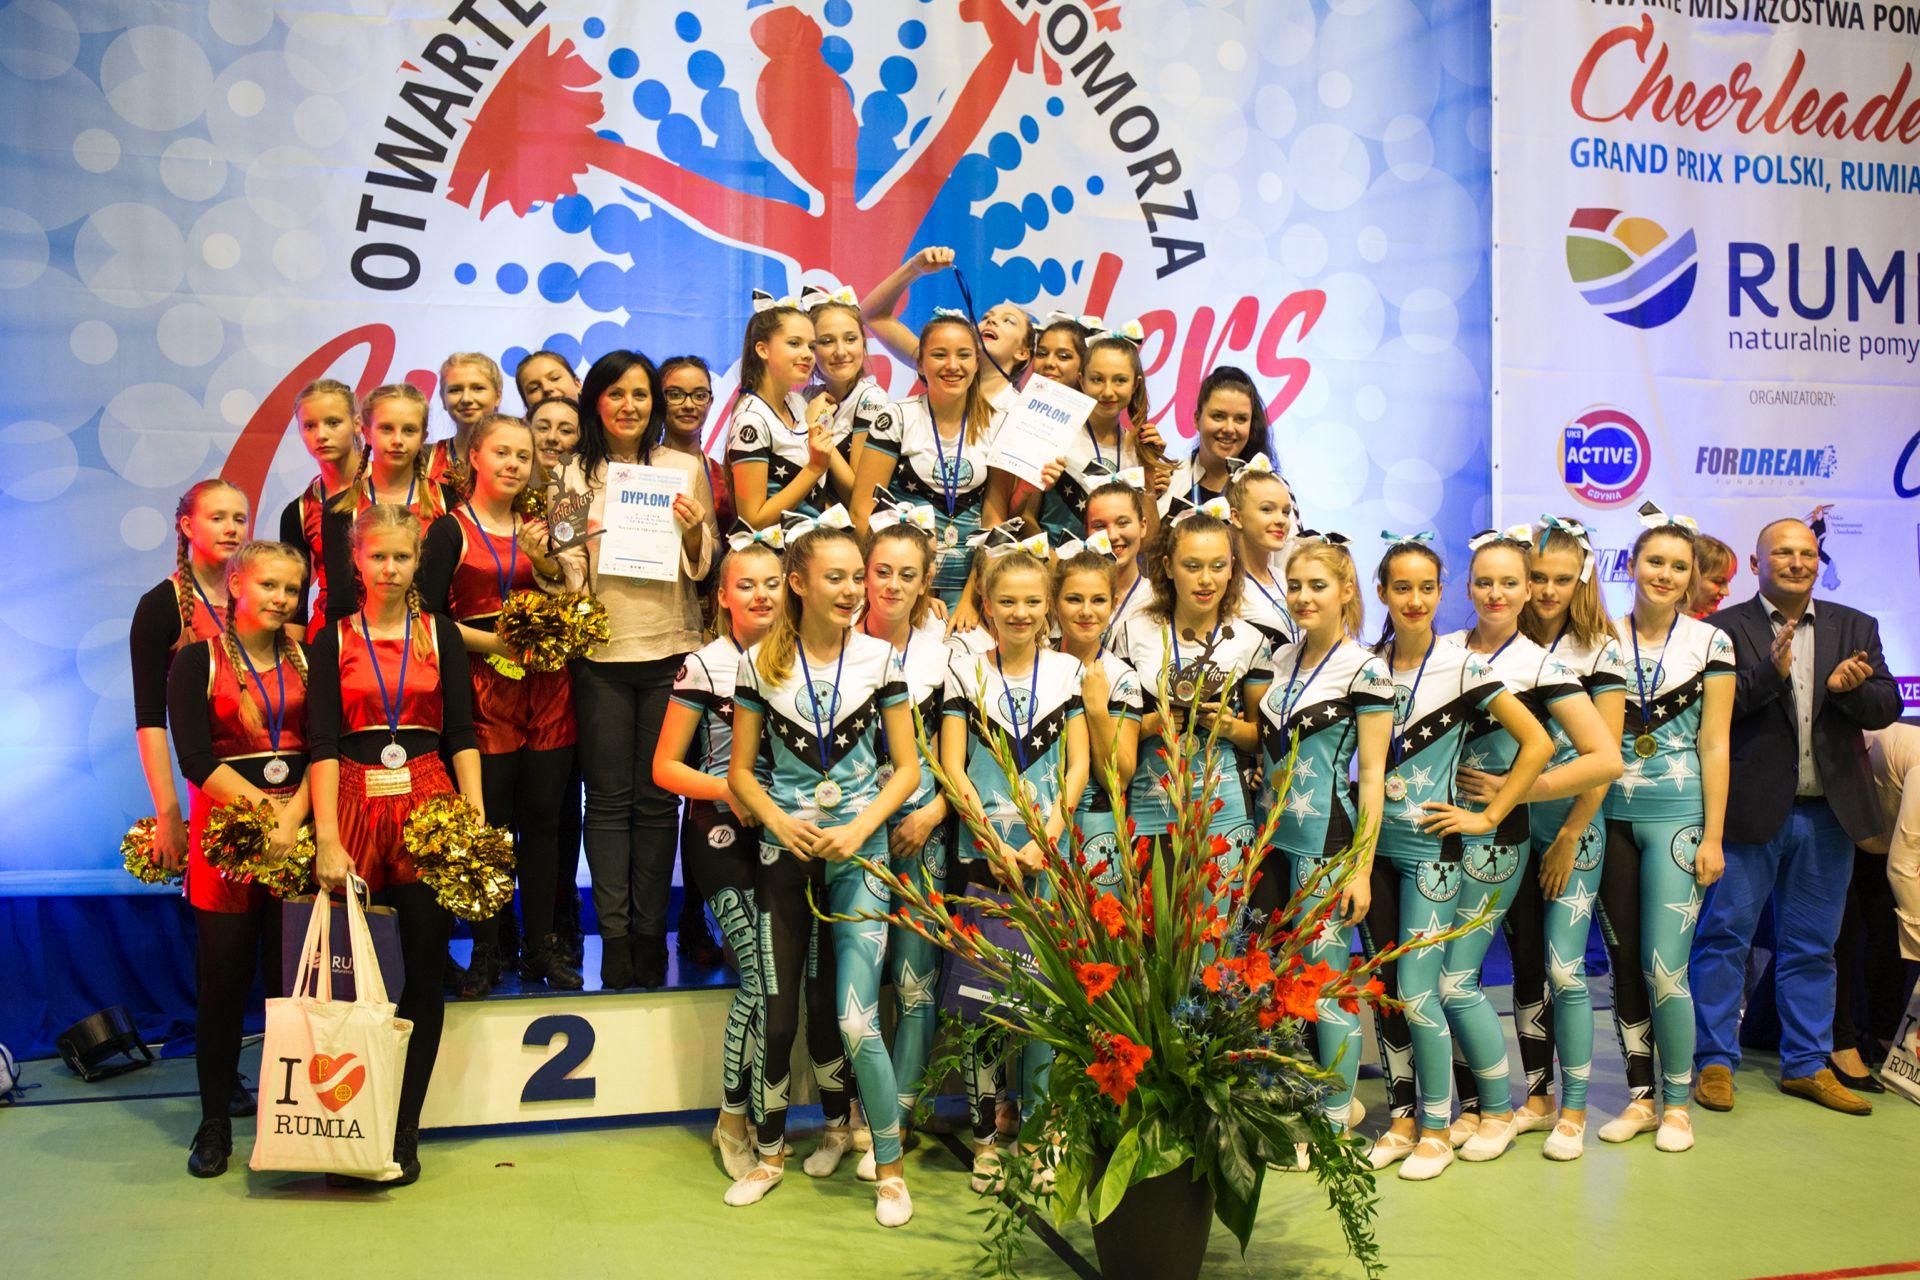 I Otwarte Mistrzostwa Pomorza Cheerleaders - Rumia 2017